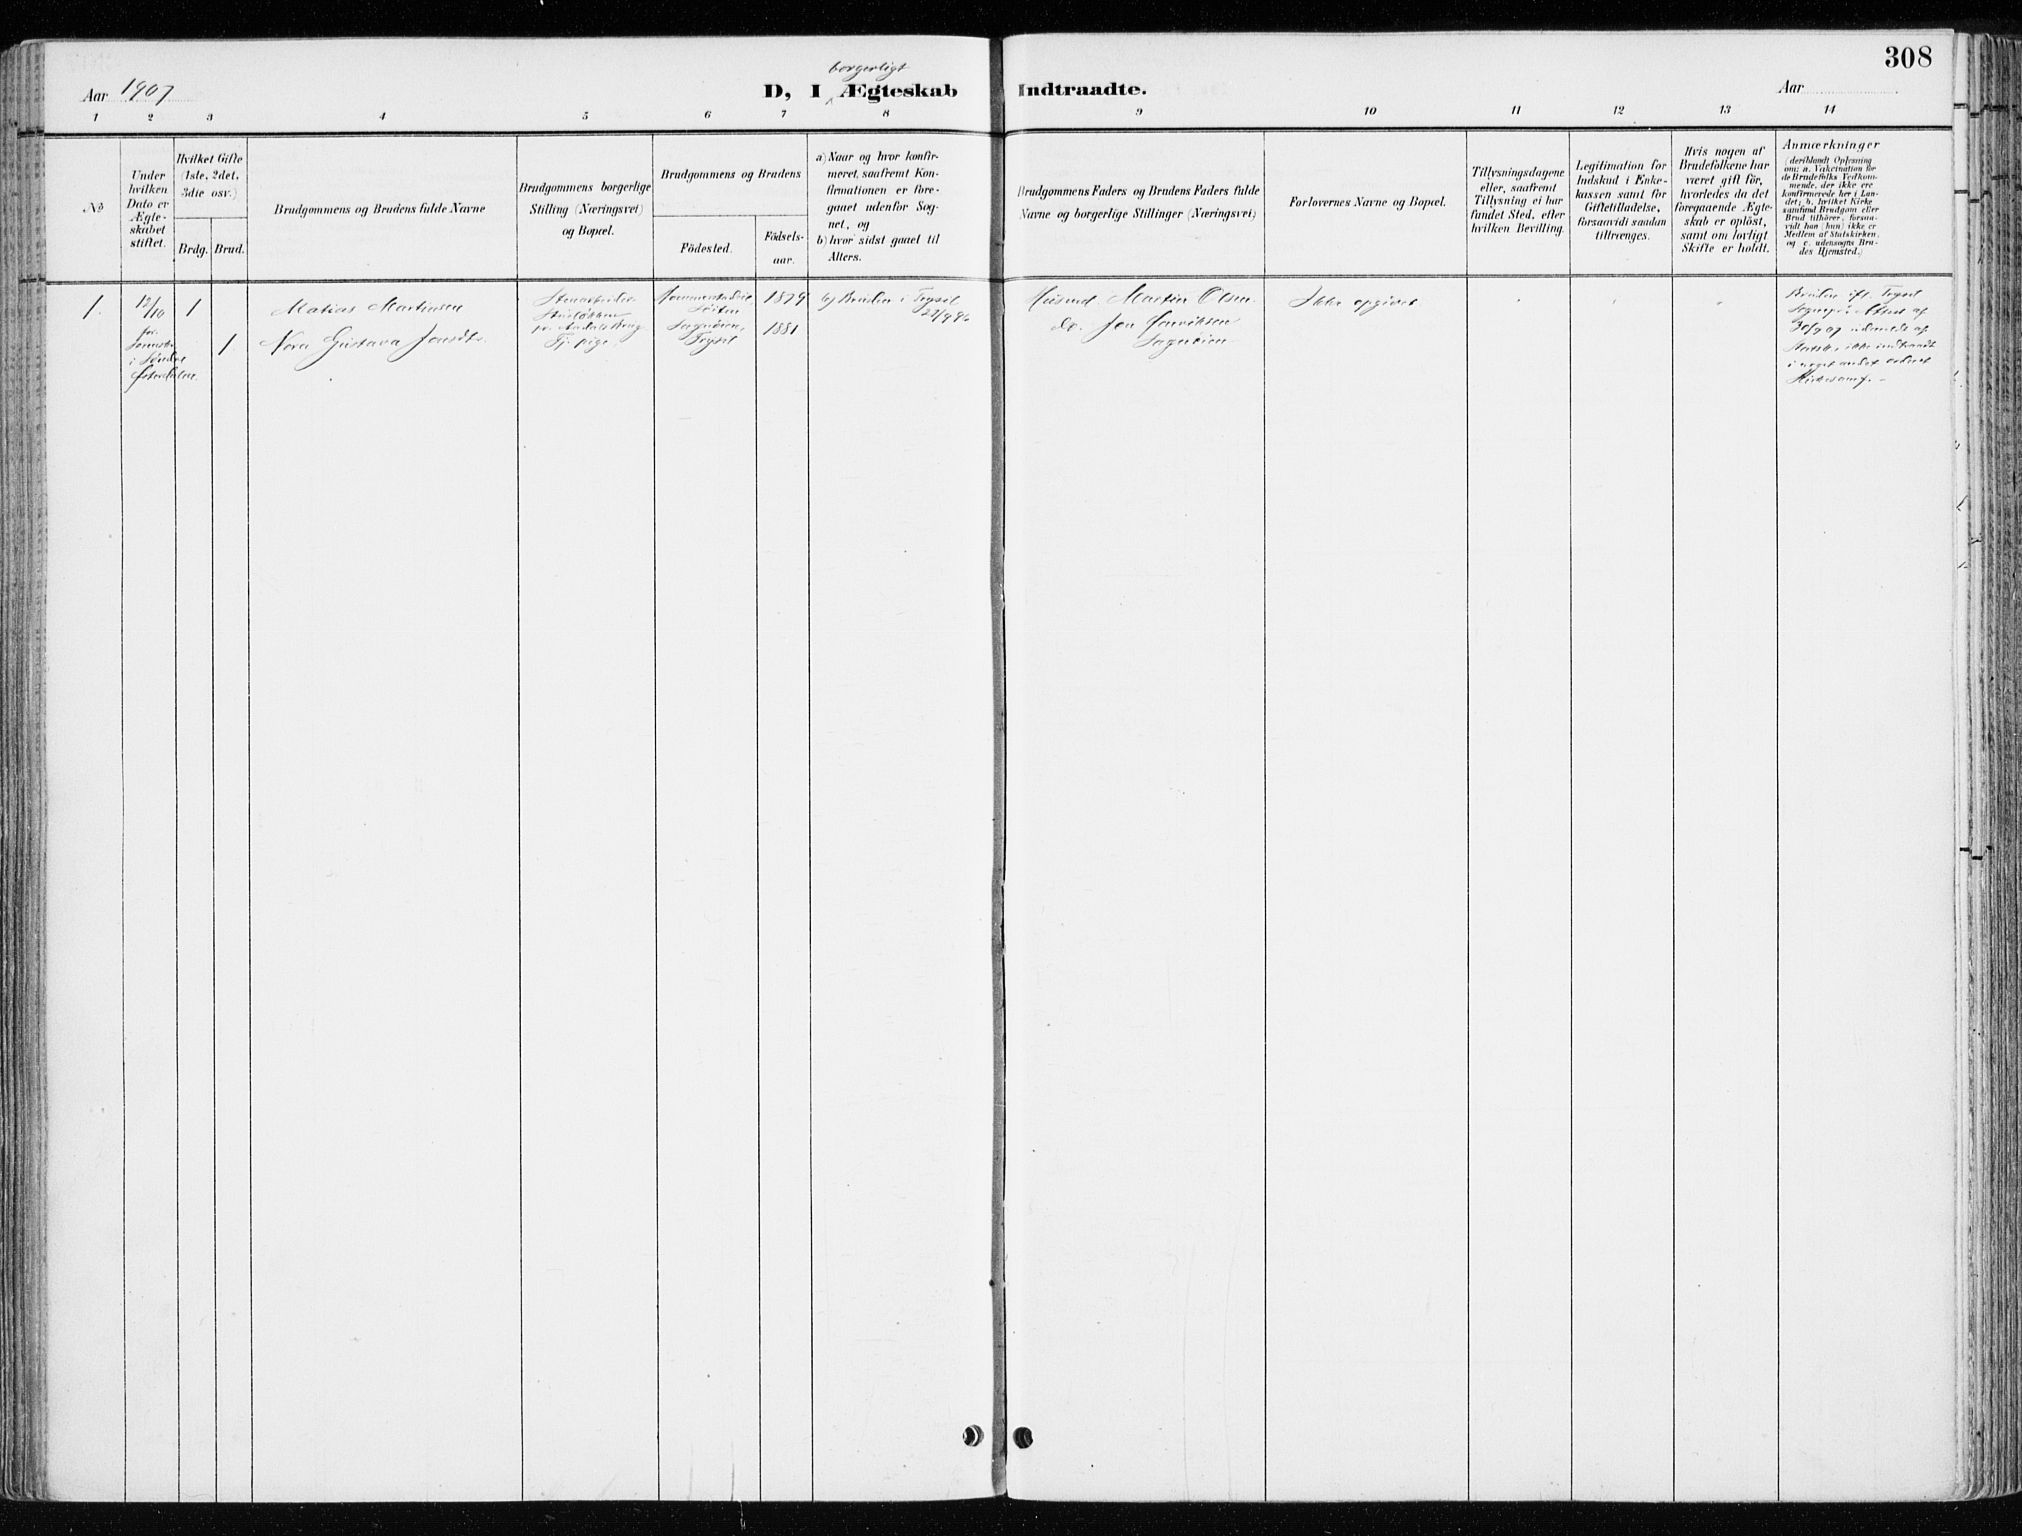 SAH, Løten prestekontor, K/Ka/L0010: Ministerialbok nr. 10, 1892-1907, s. 308